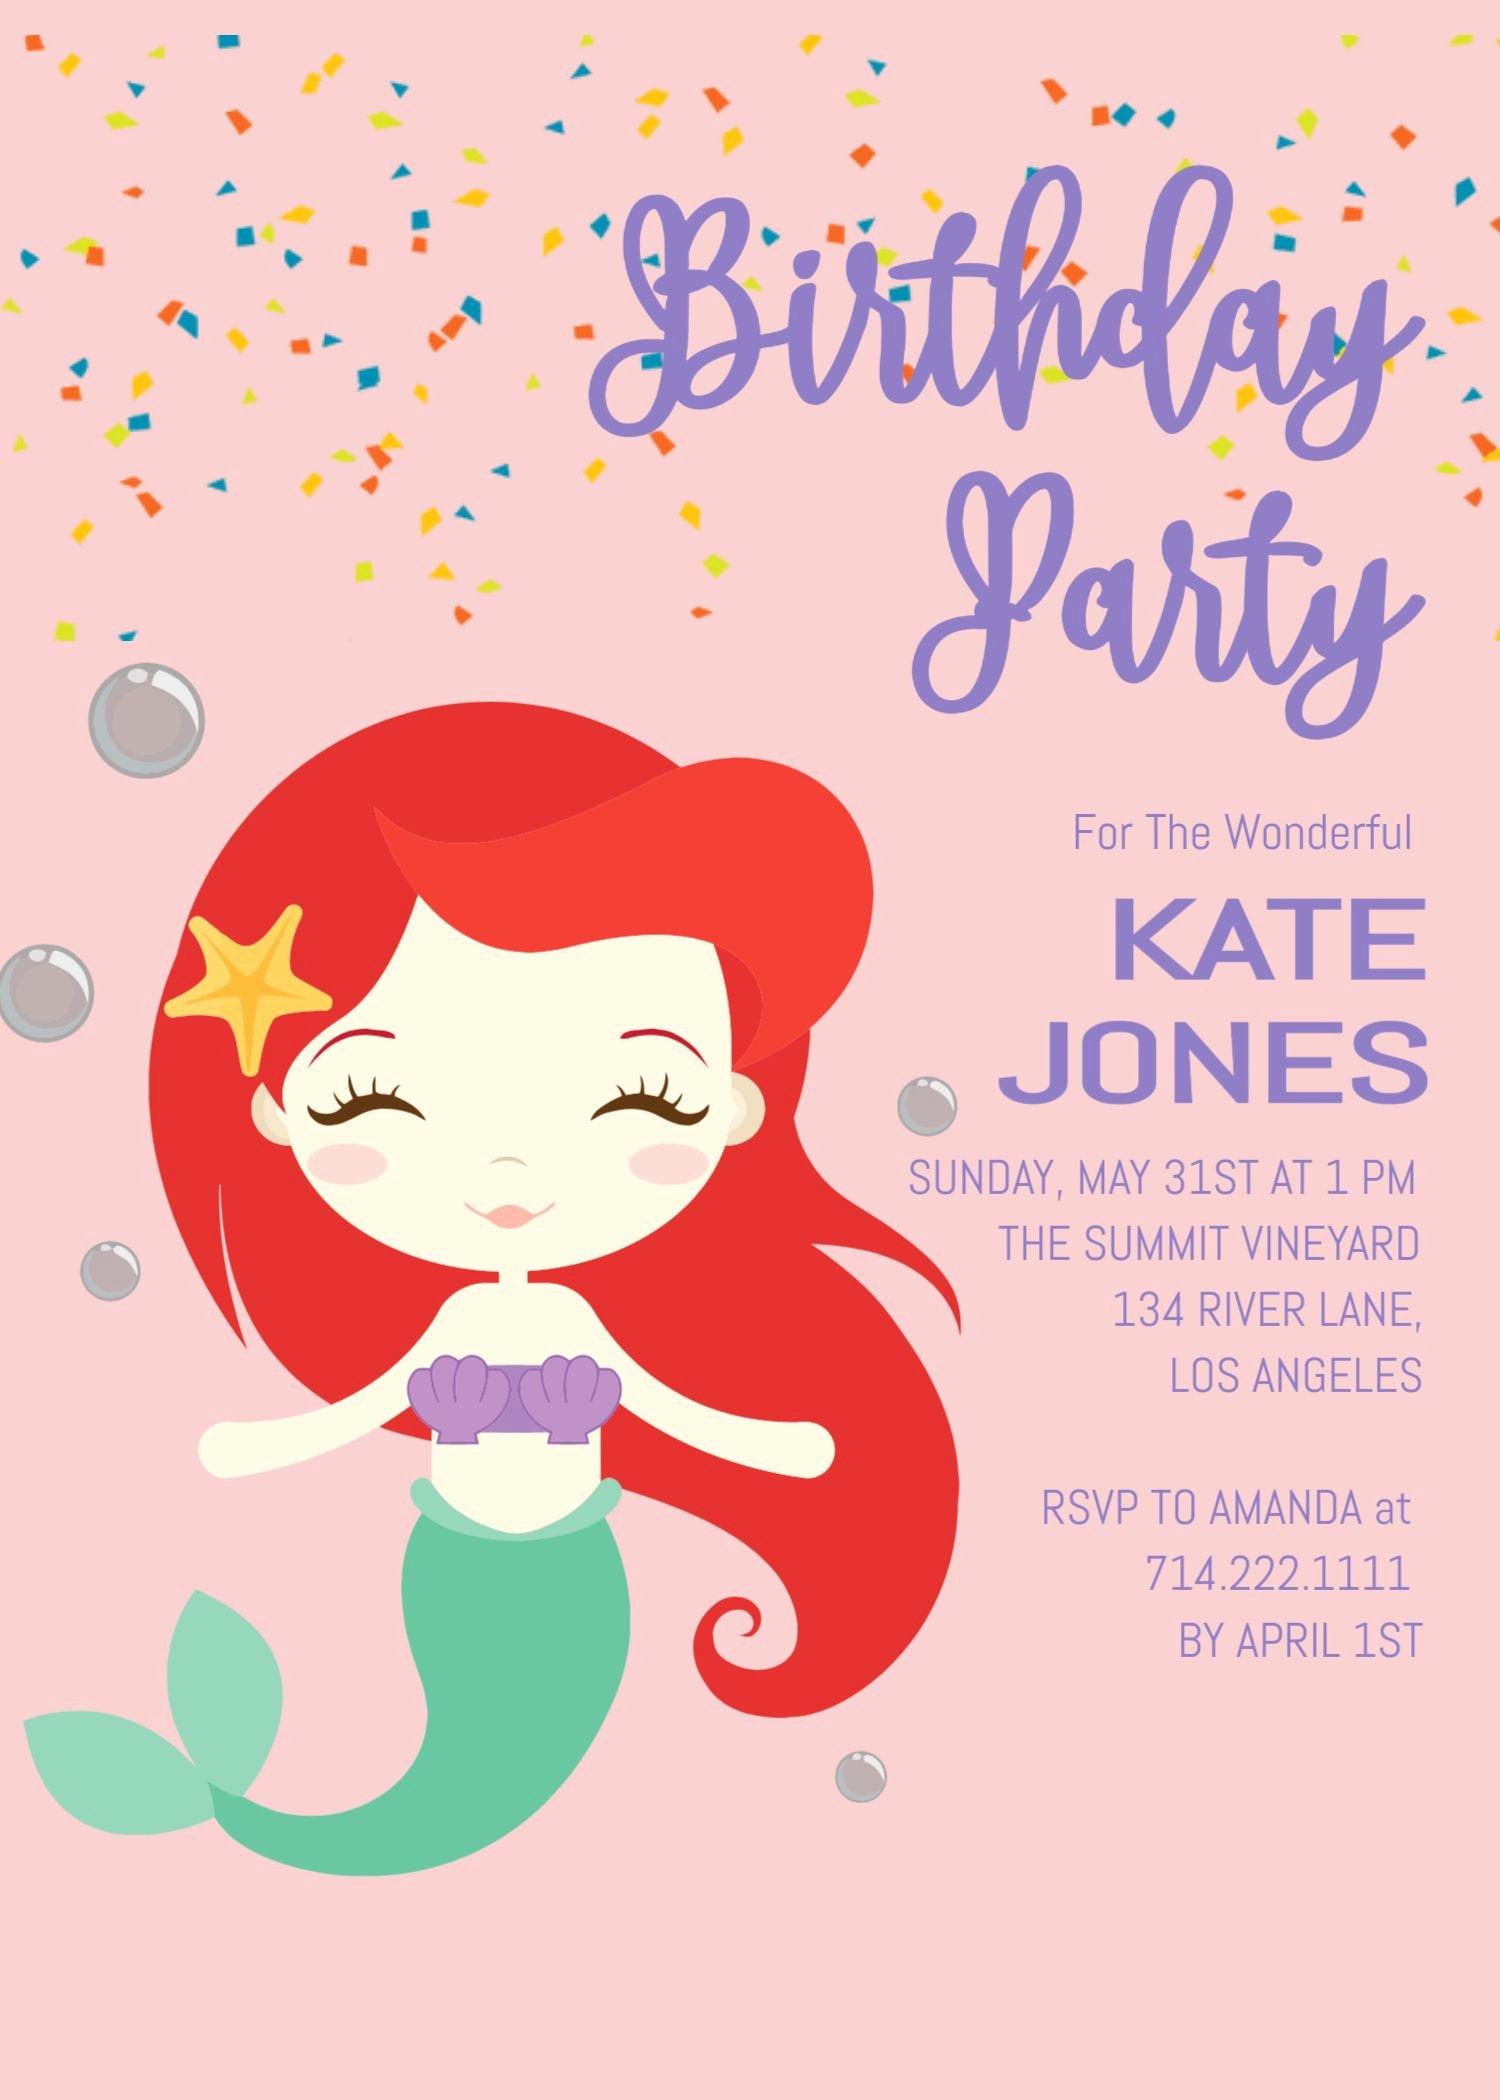 Mermaid Birthday Invitation Templates Lovely Little Mermaid Birthday Invitation Invite Under the Sea